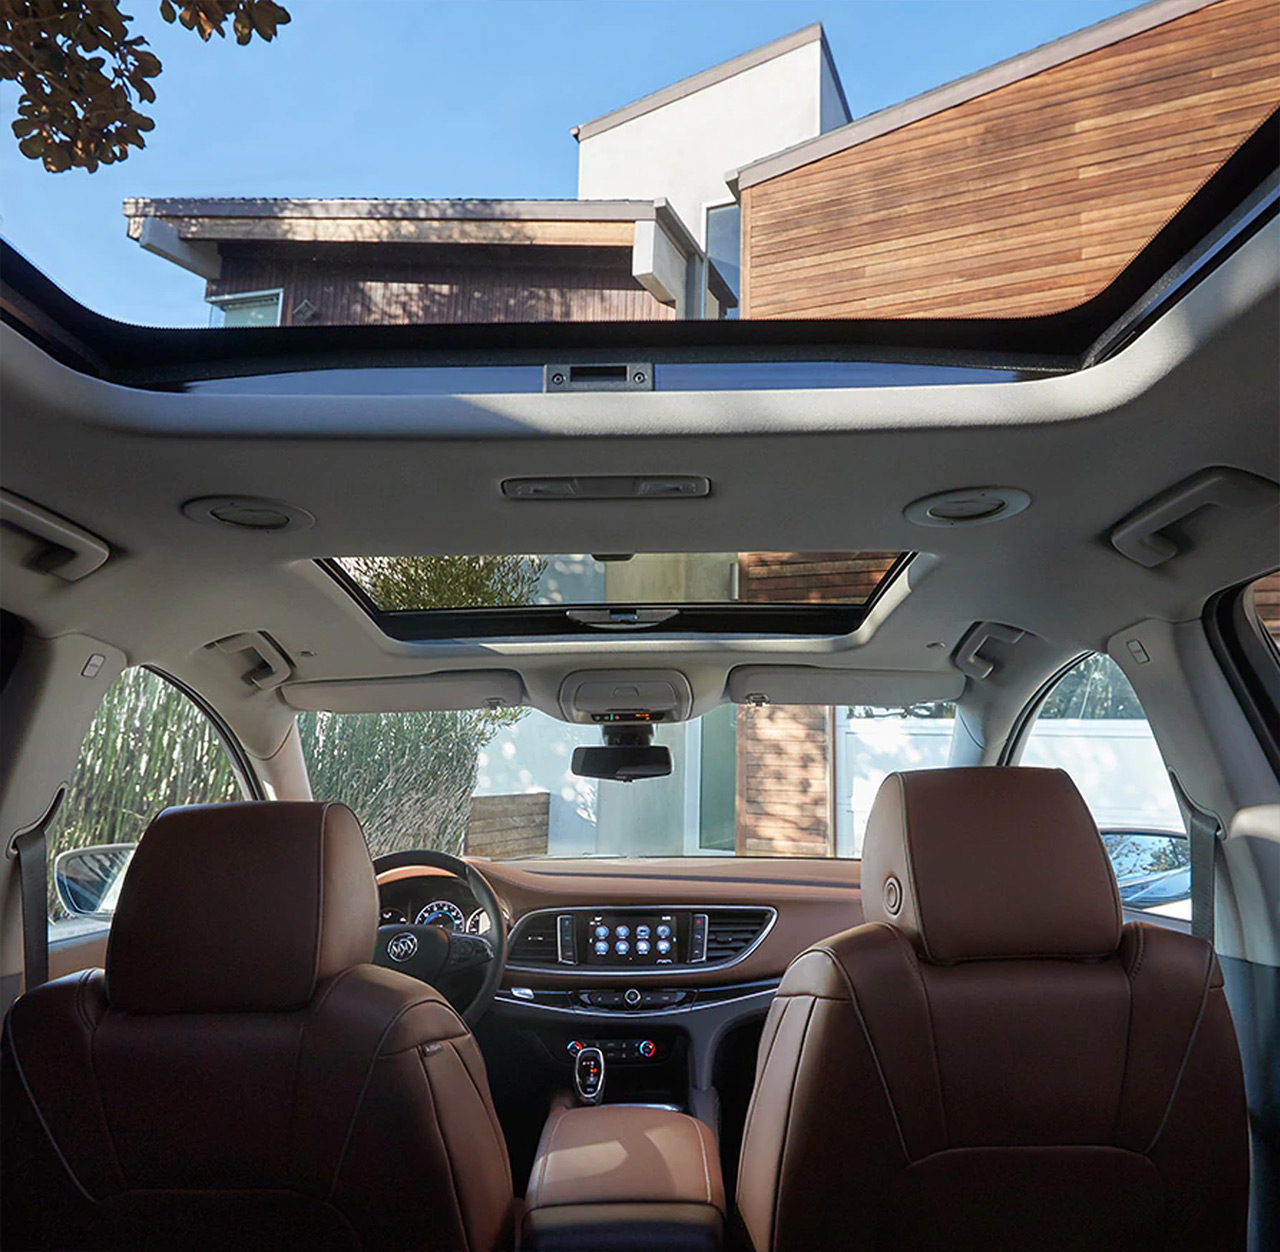 2019 Enclave Avenir Interior 1